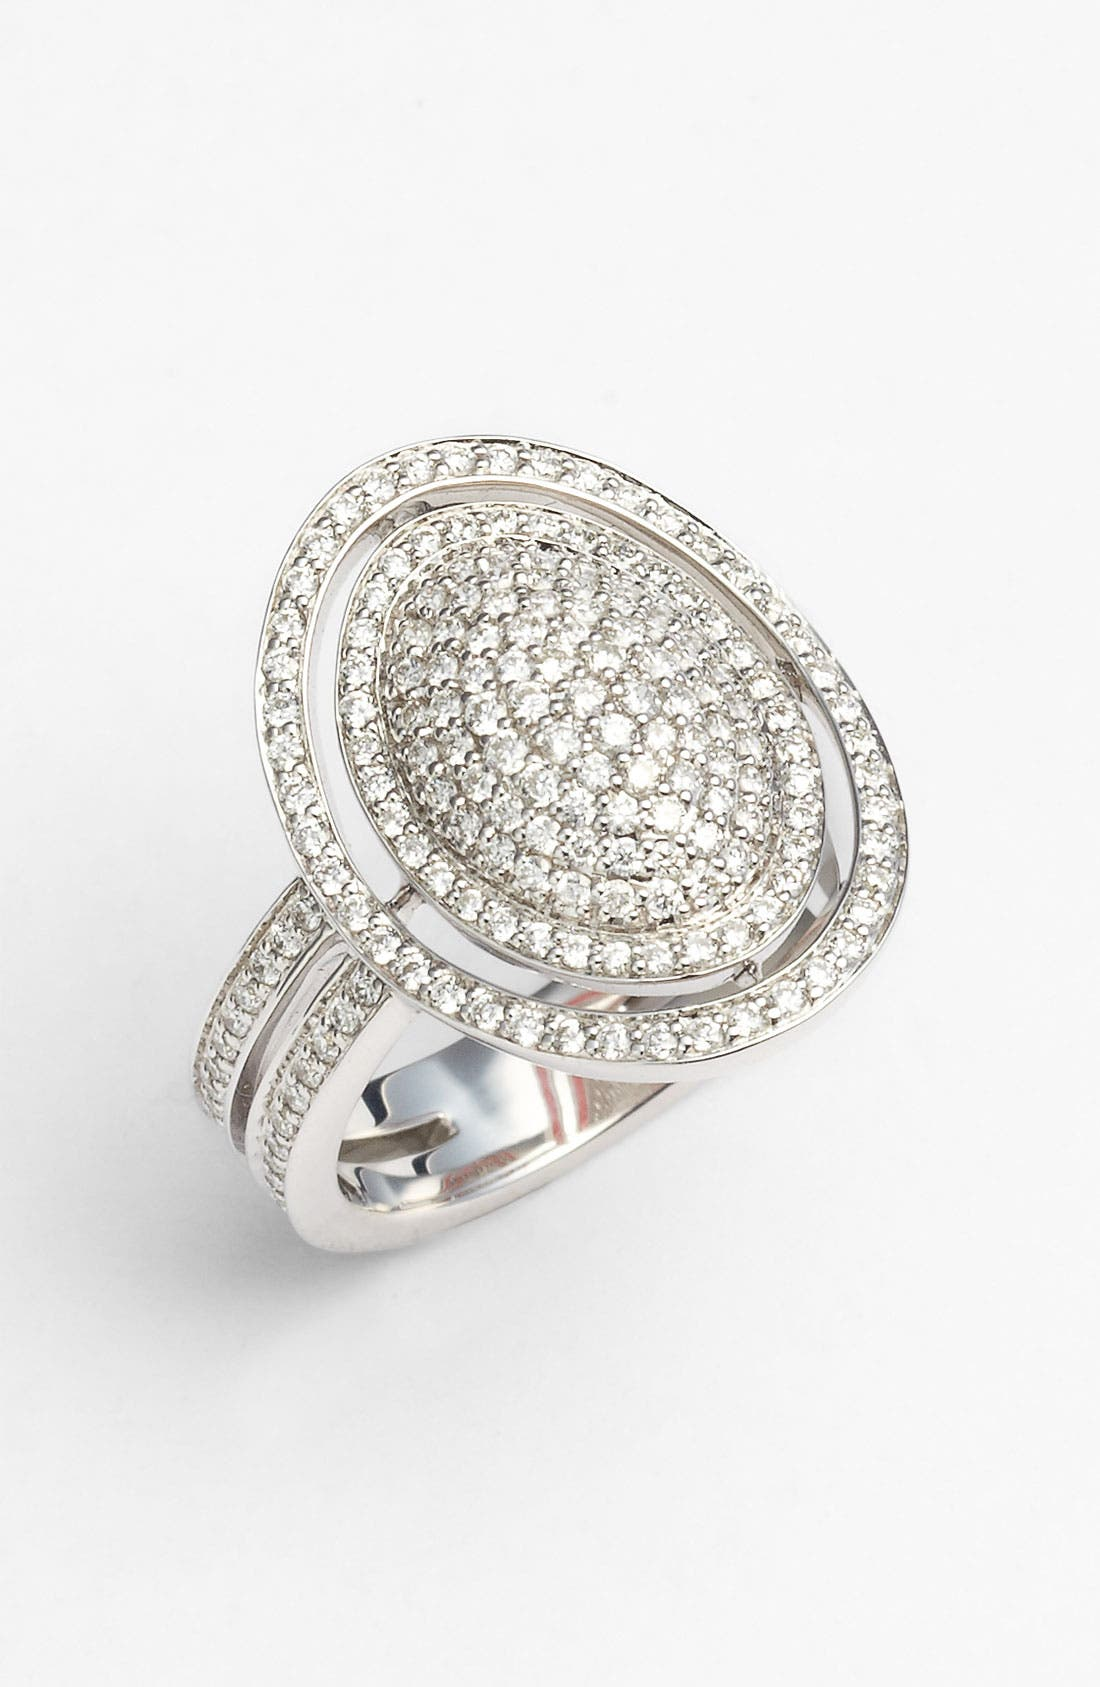 Alternate Image 1 Selected - Ivanka Trump 'Signature' Pavé Diamond Ring